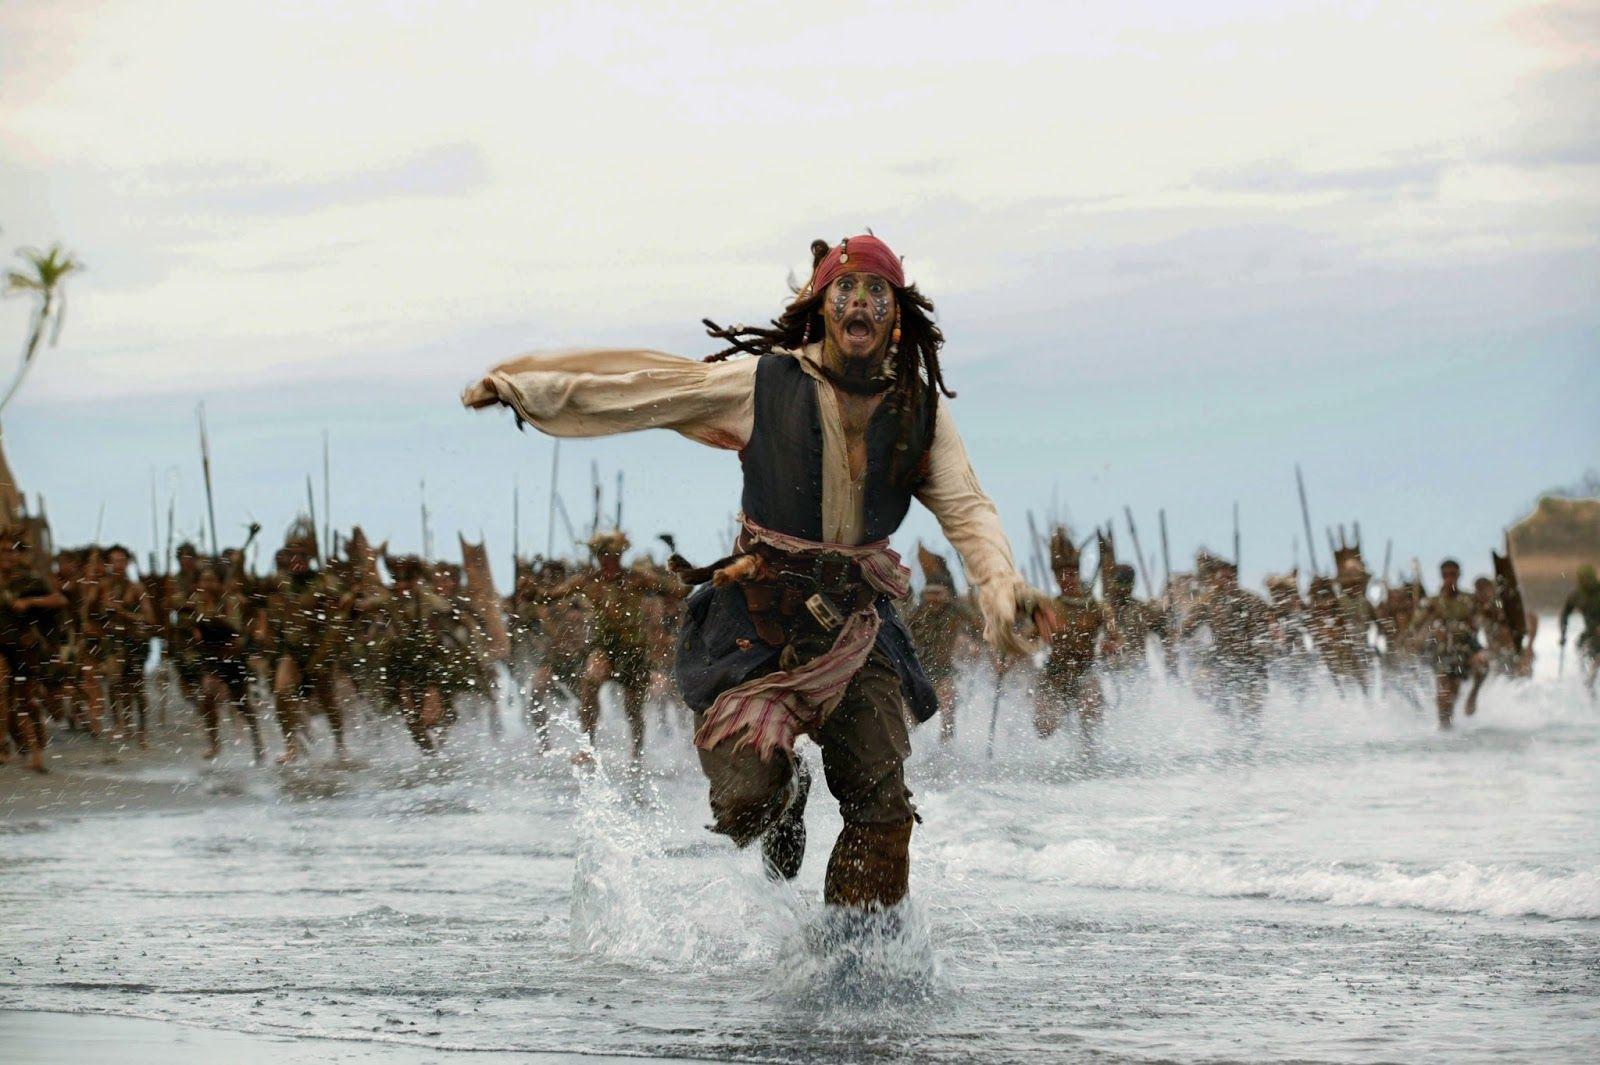 3065 - ¿Eres un verdadero pirata? Test de Piratas del Caribe